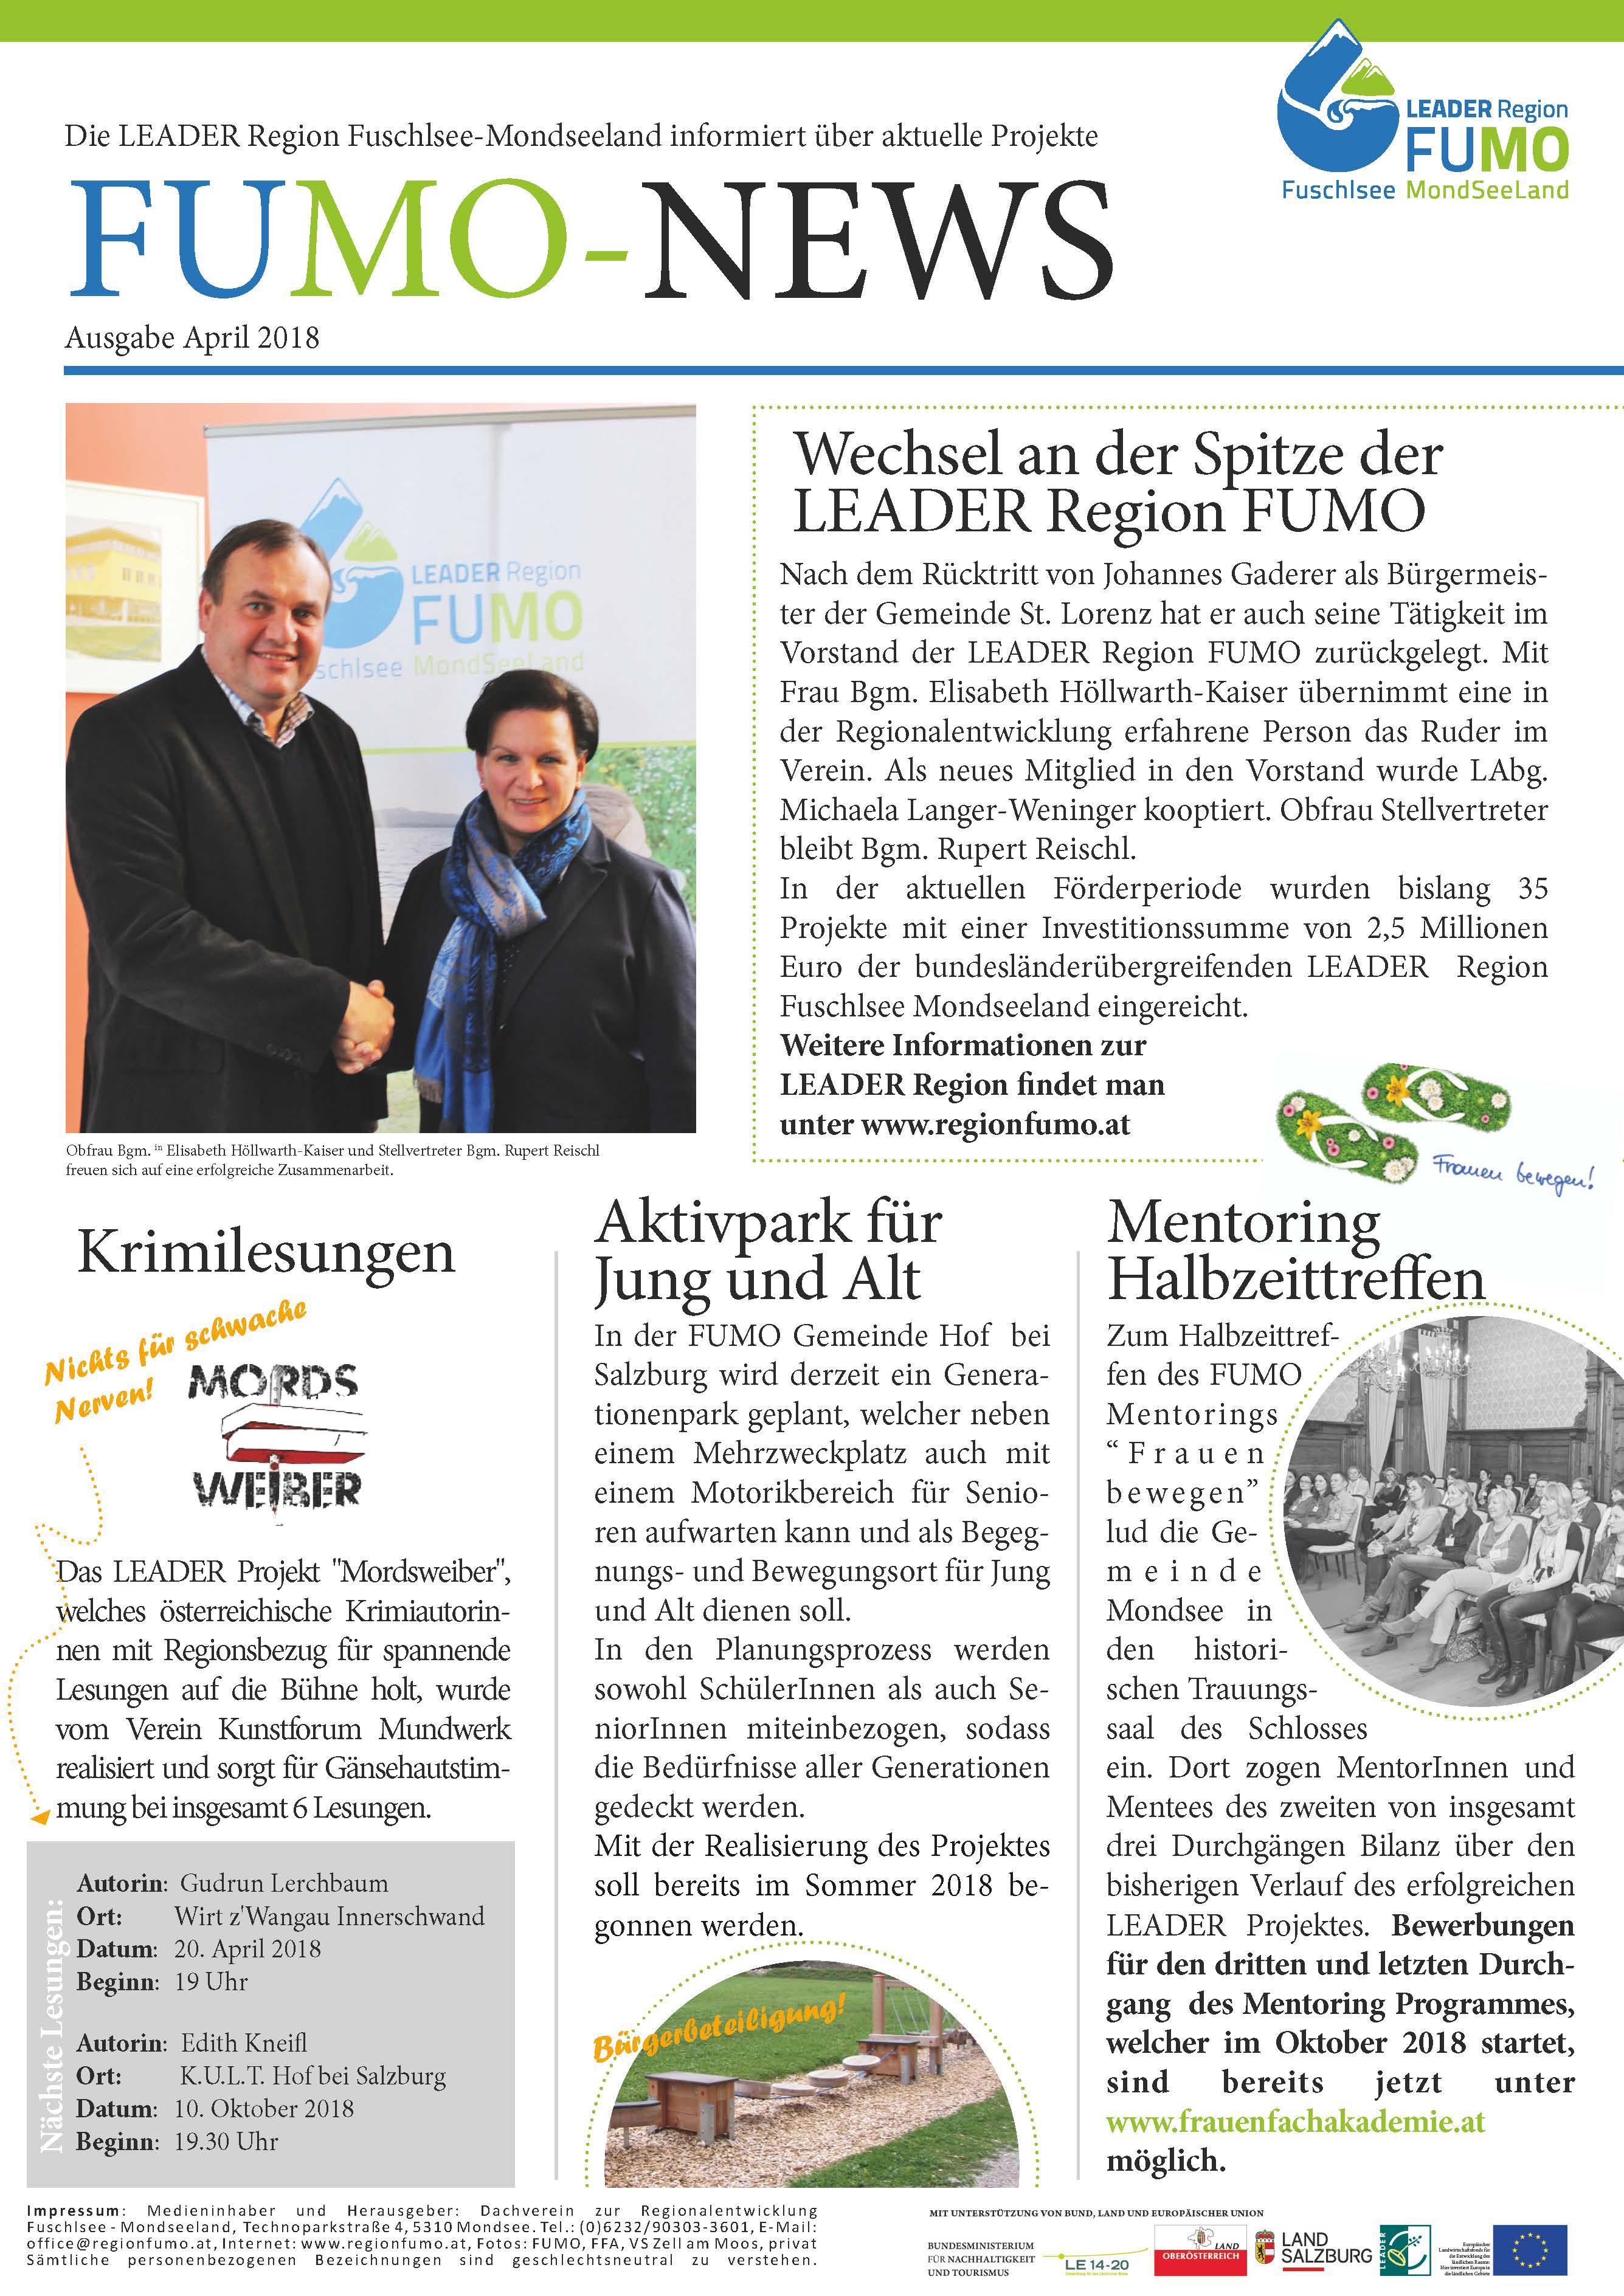 FUMO news 032018_Seite_1